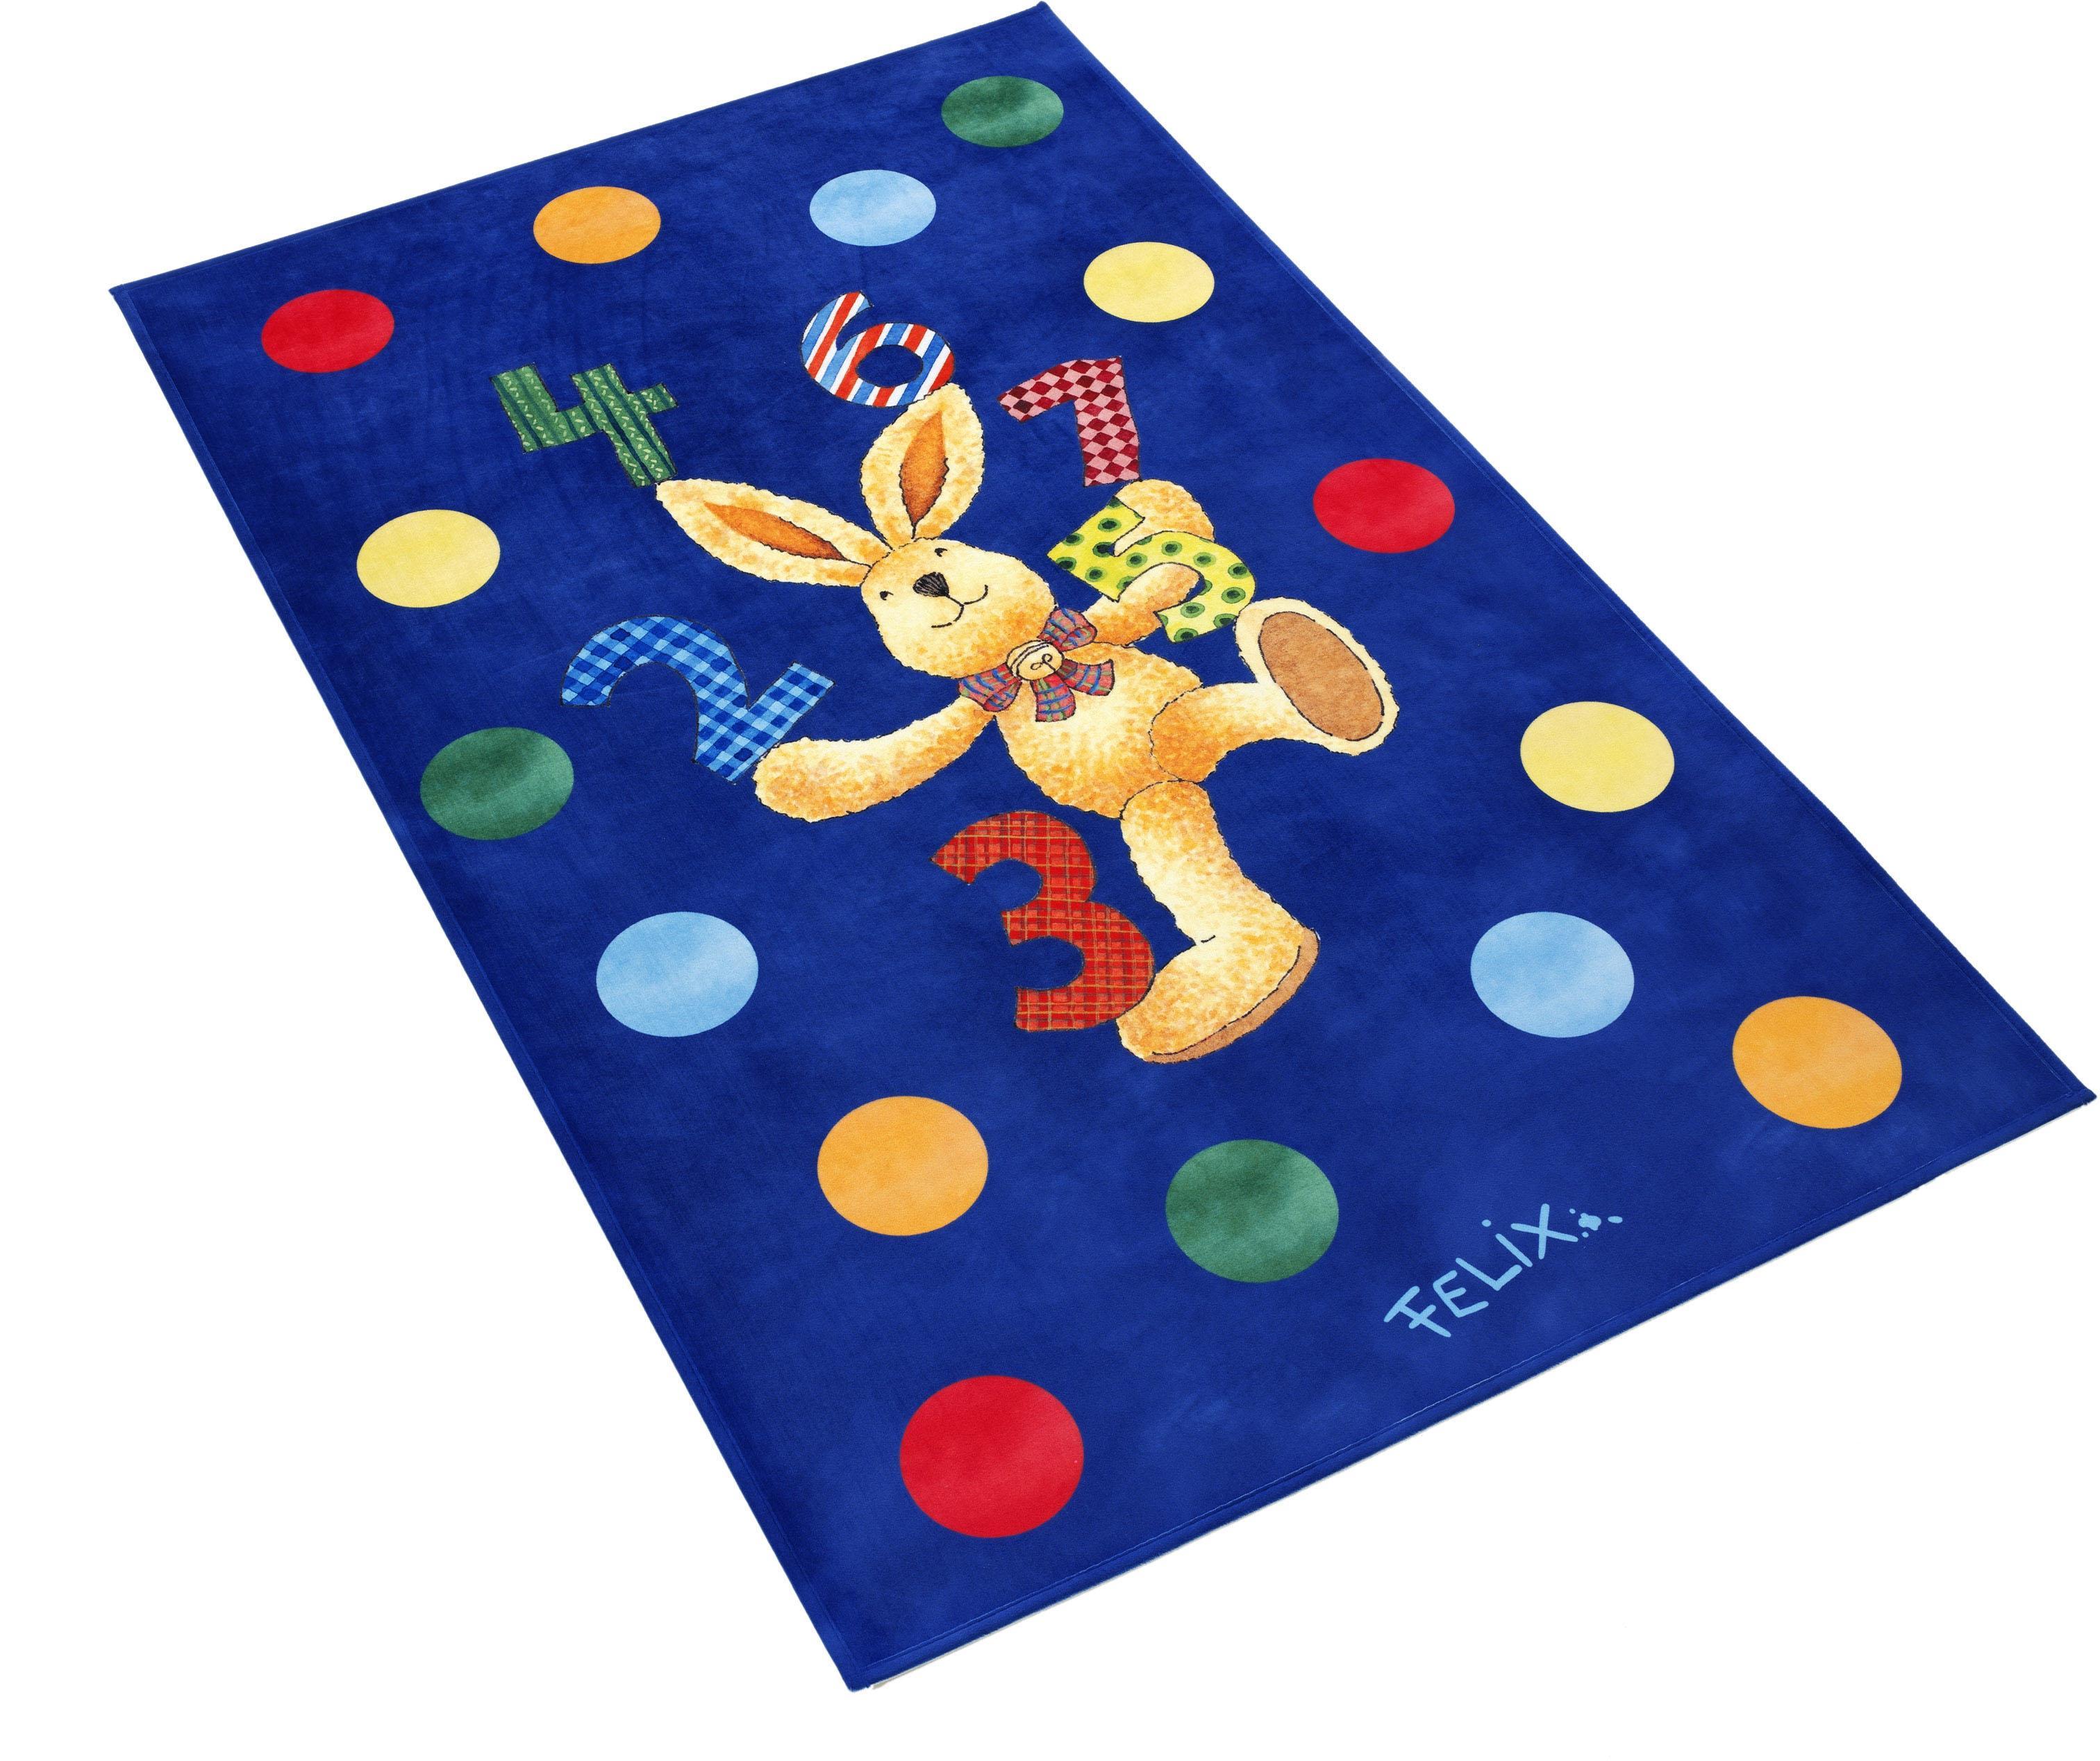 Kinderteppich FE-413 Felix der Hase rechteckig Höhe 6 mm gedruckt